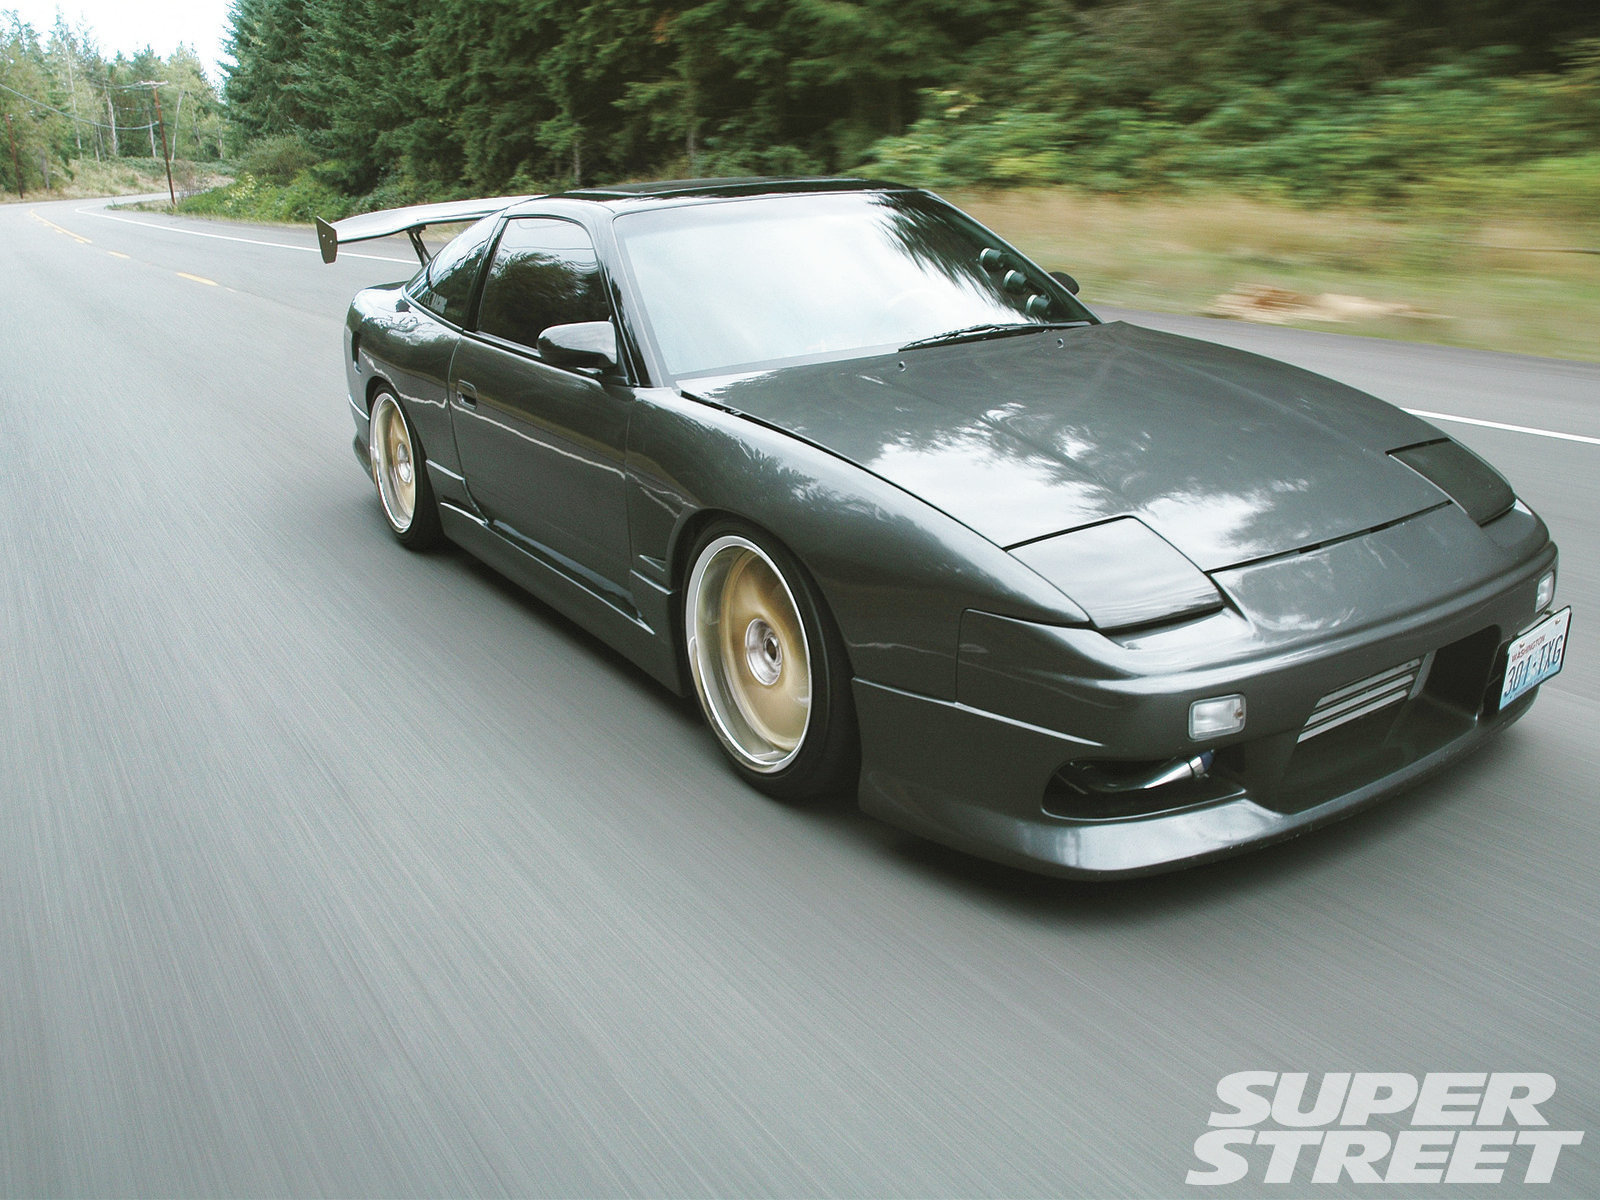 Cheap Sports Cars Under 10000 >> 10 Project Cars Under 10k Super Street Magazine